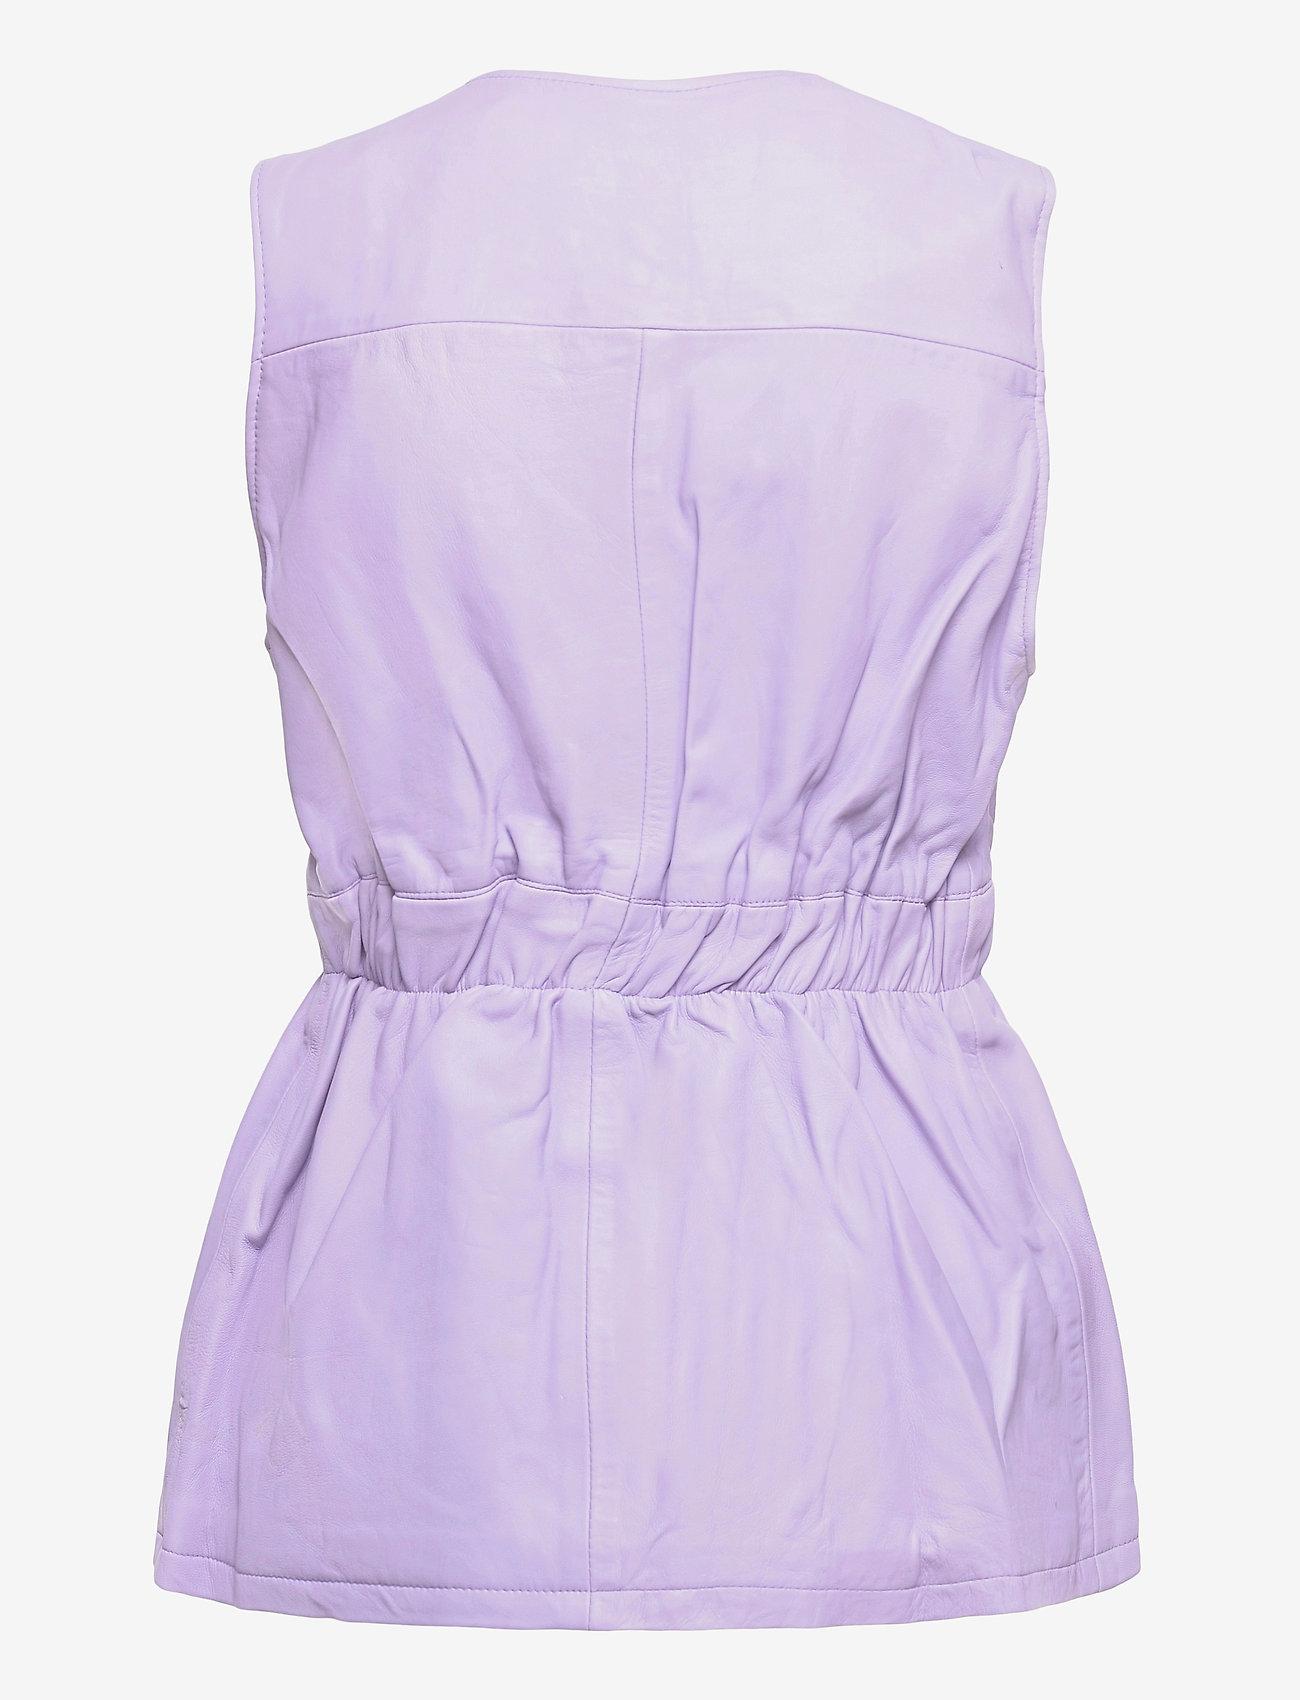 Hosbjerg - AMY BRODIE VEST - puffer vests - light purple/purple - 1